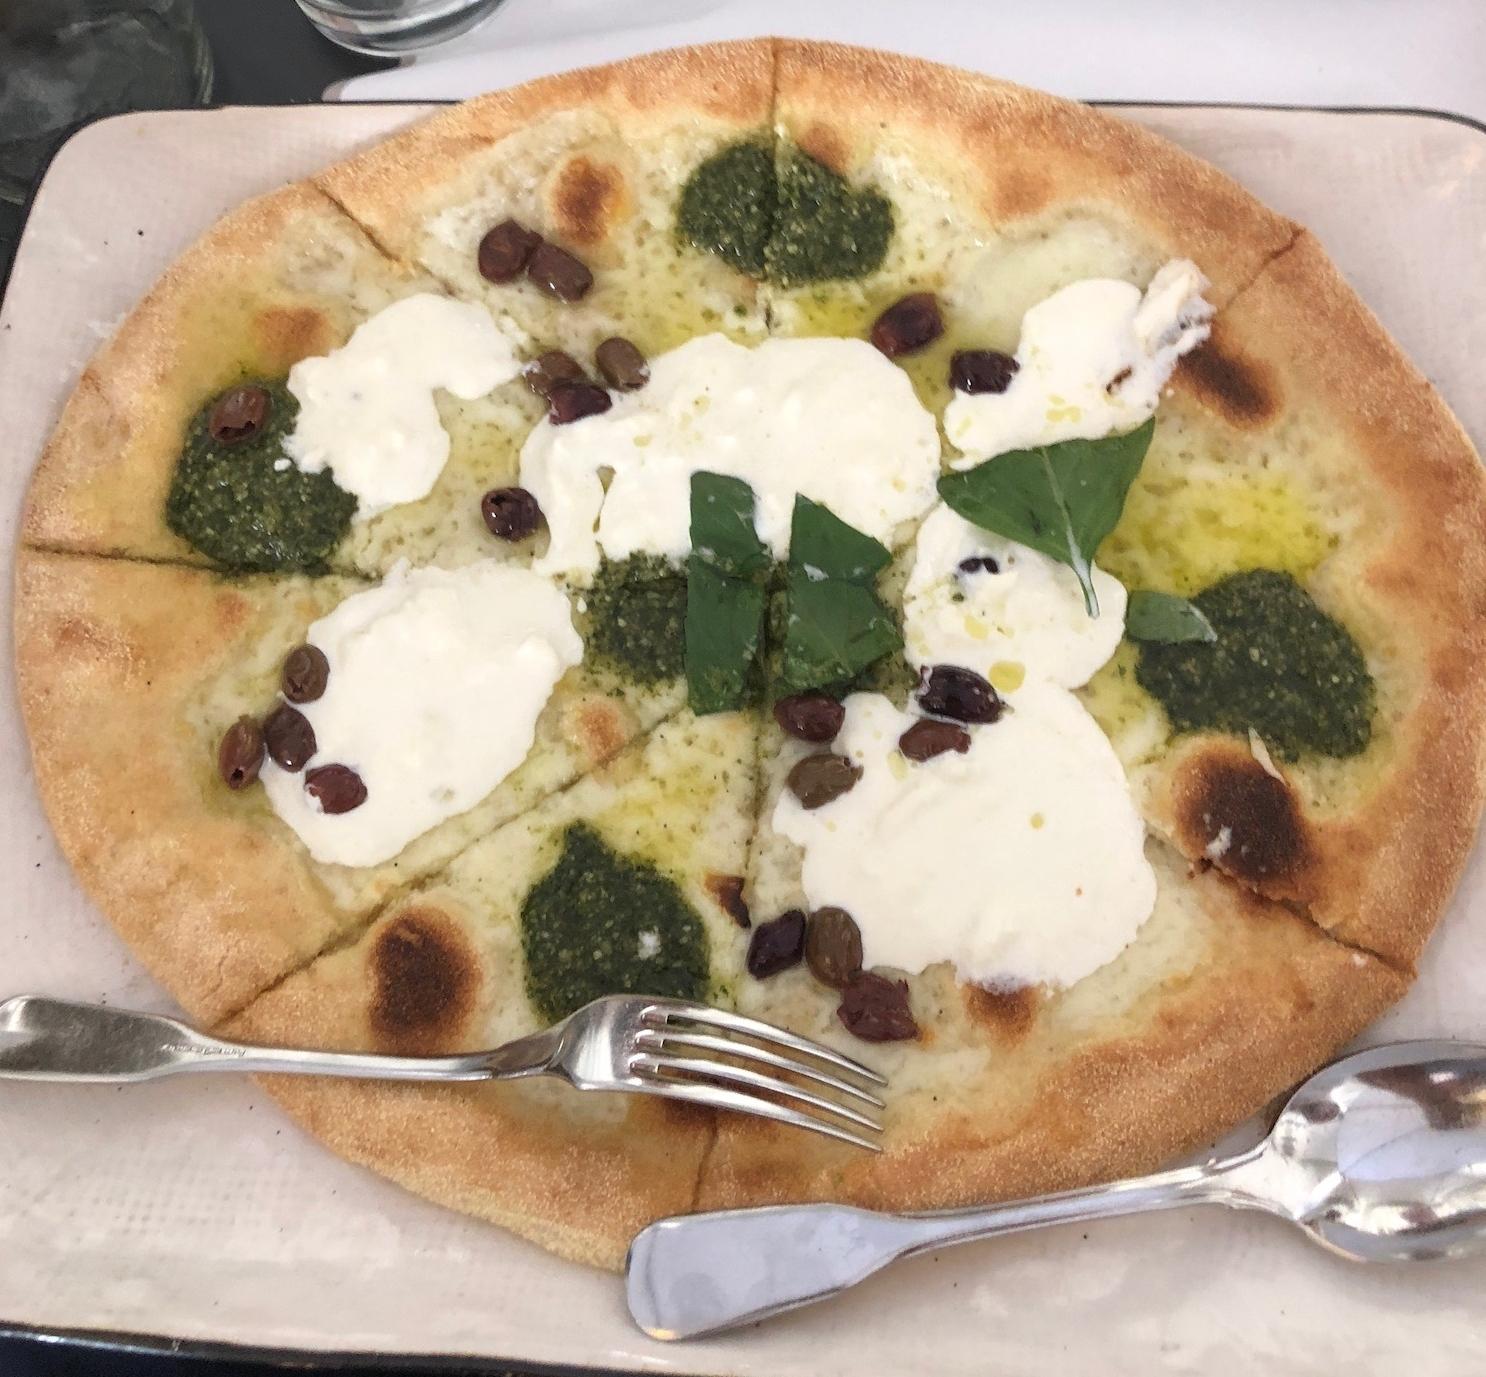 Pizza with pesto, homemade mozzarella, basil and Greek olives.